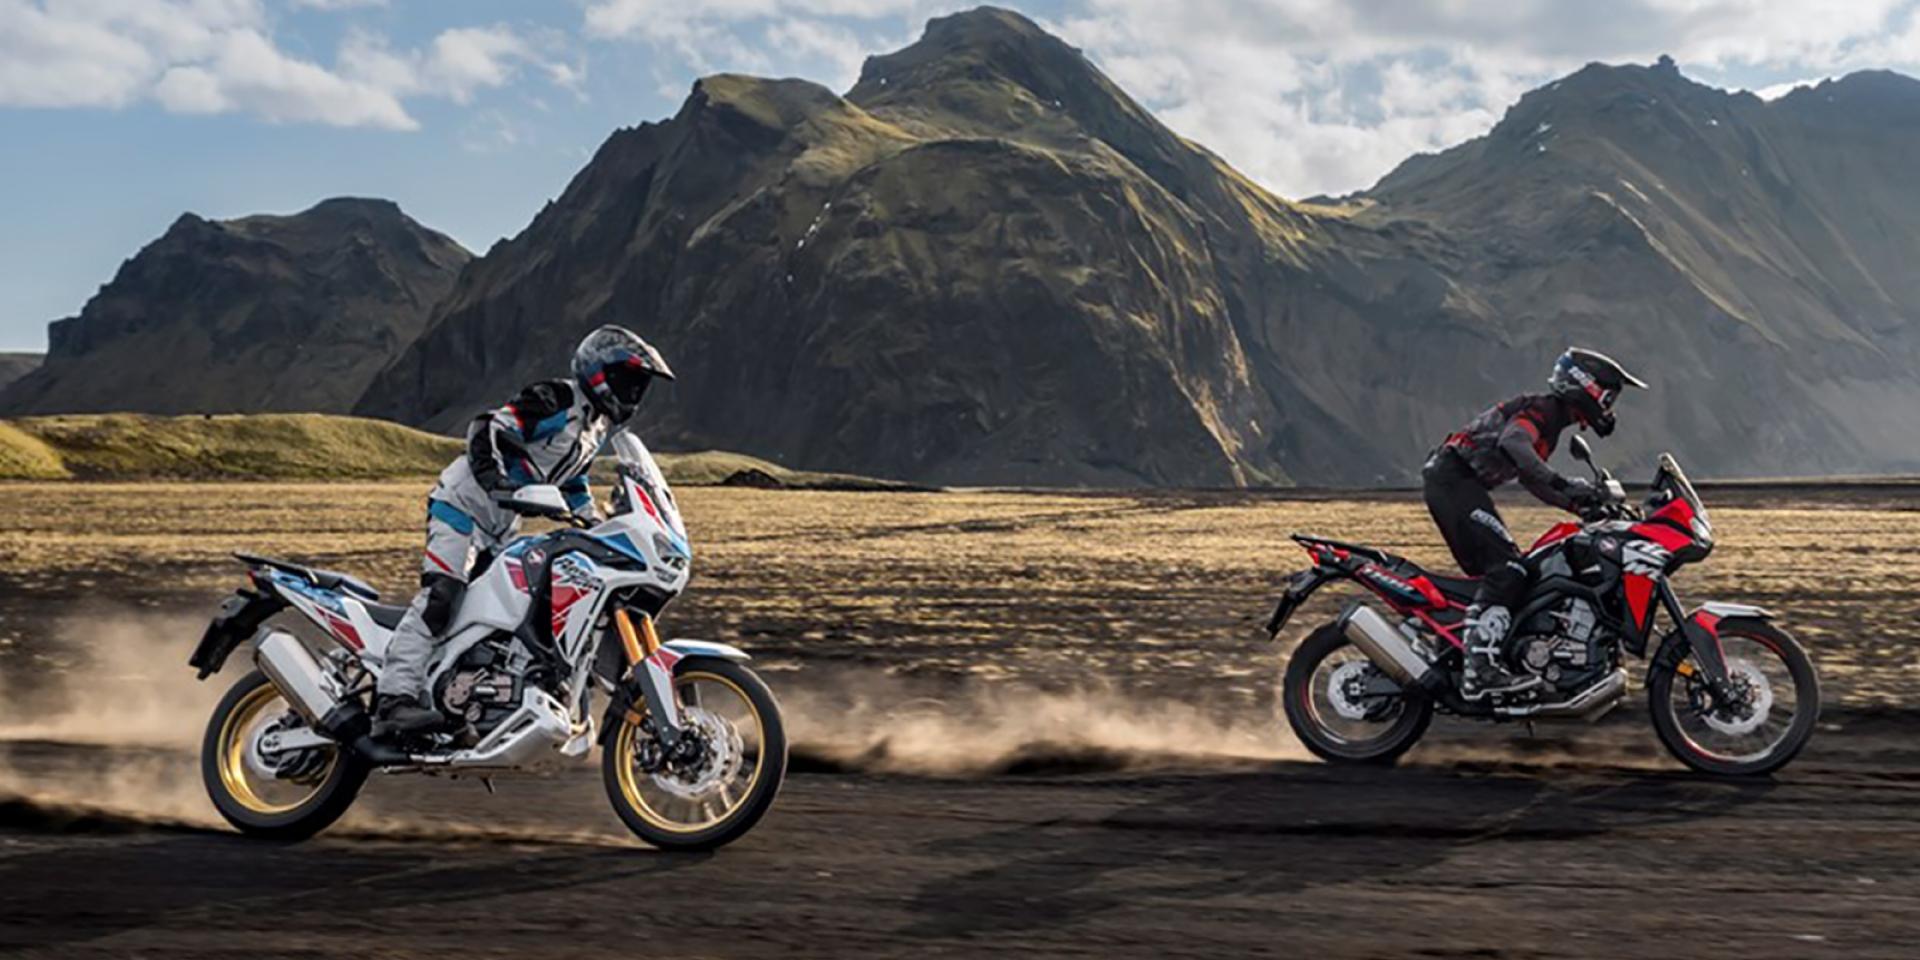 Honda Motorcycle 2022年式 AFRICA TWIN / AFRICA TWIN ADVENTURE SPORTS 長征座駕,磅礡發表!